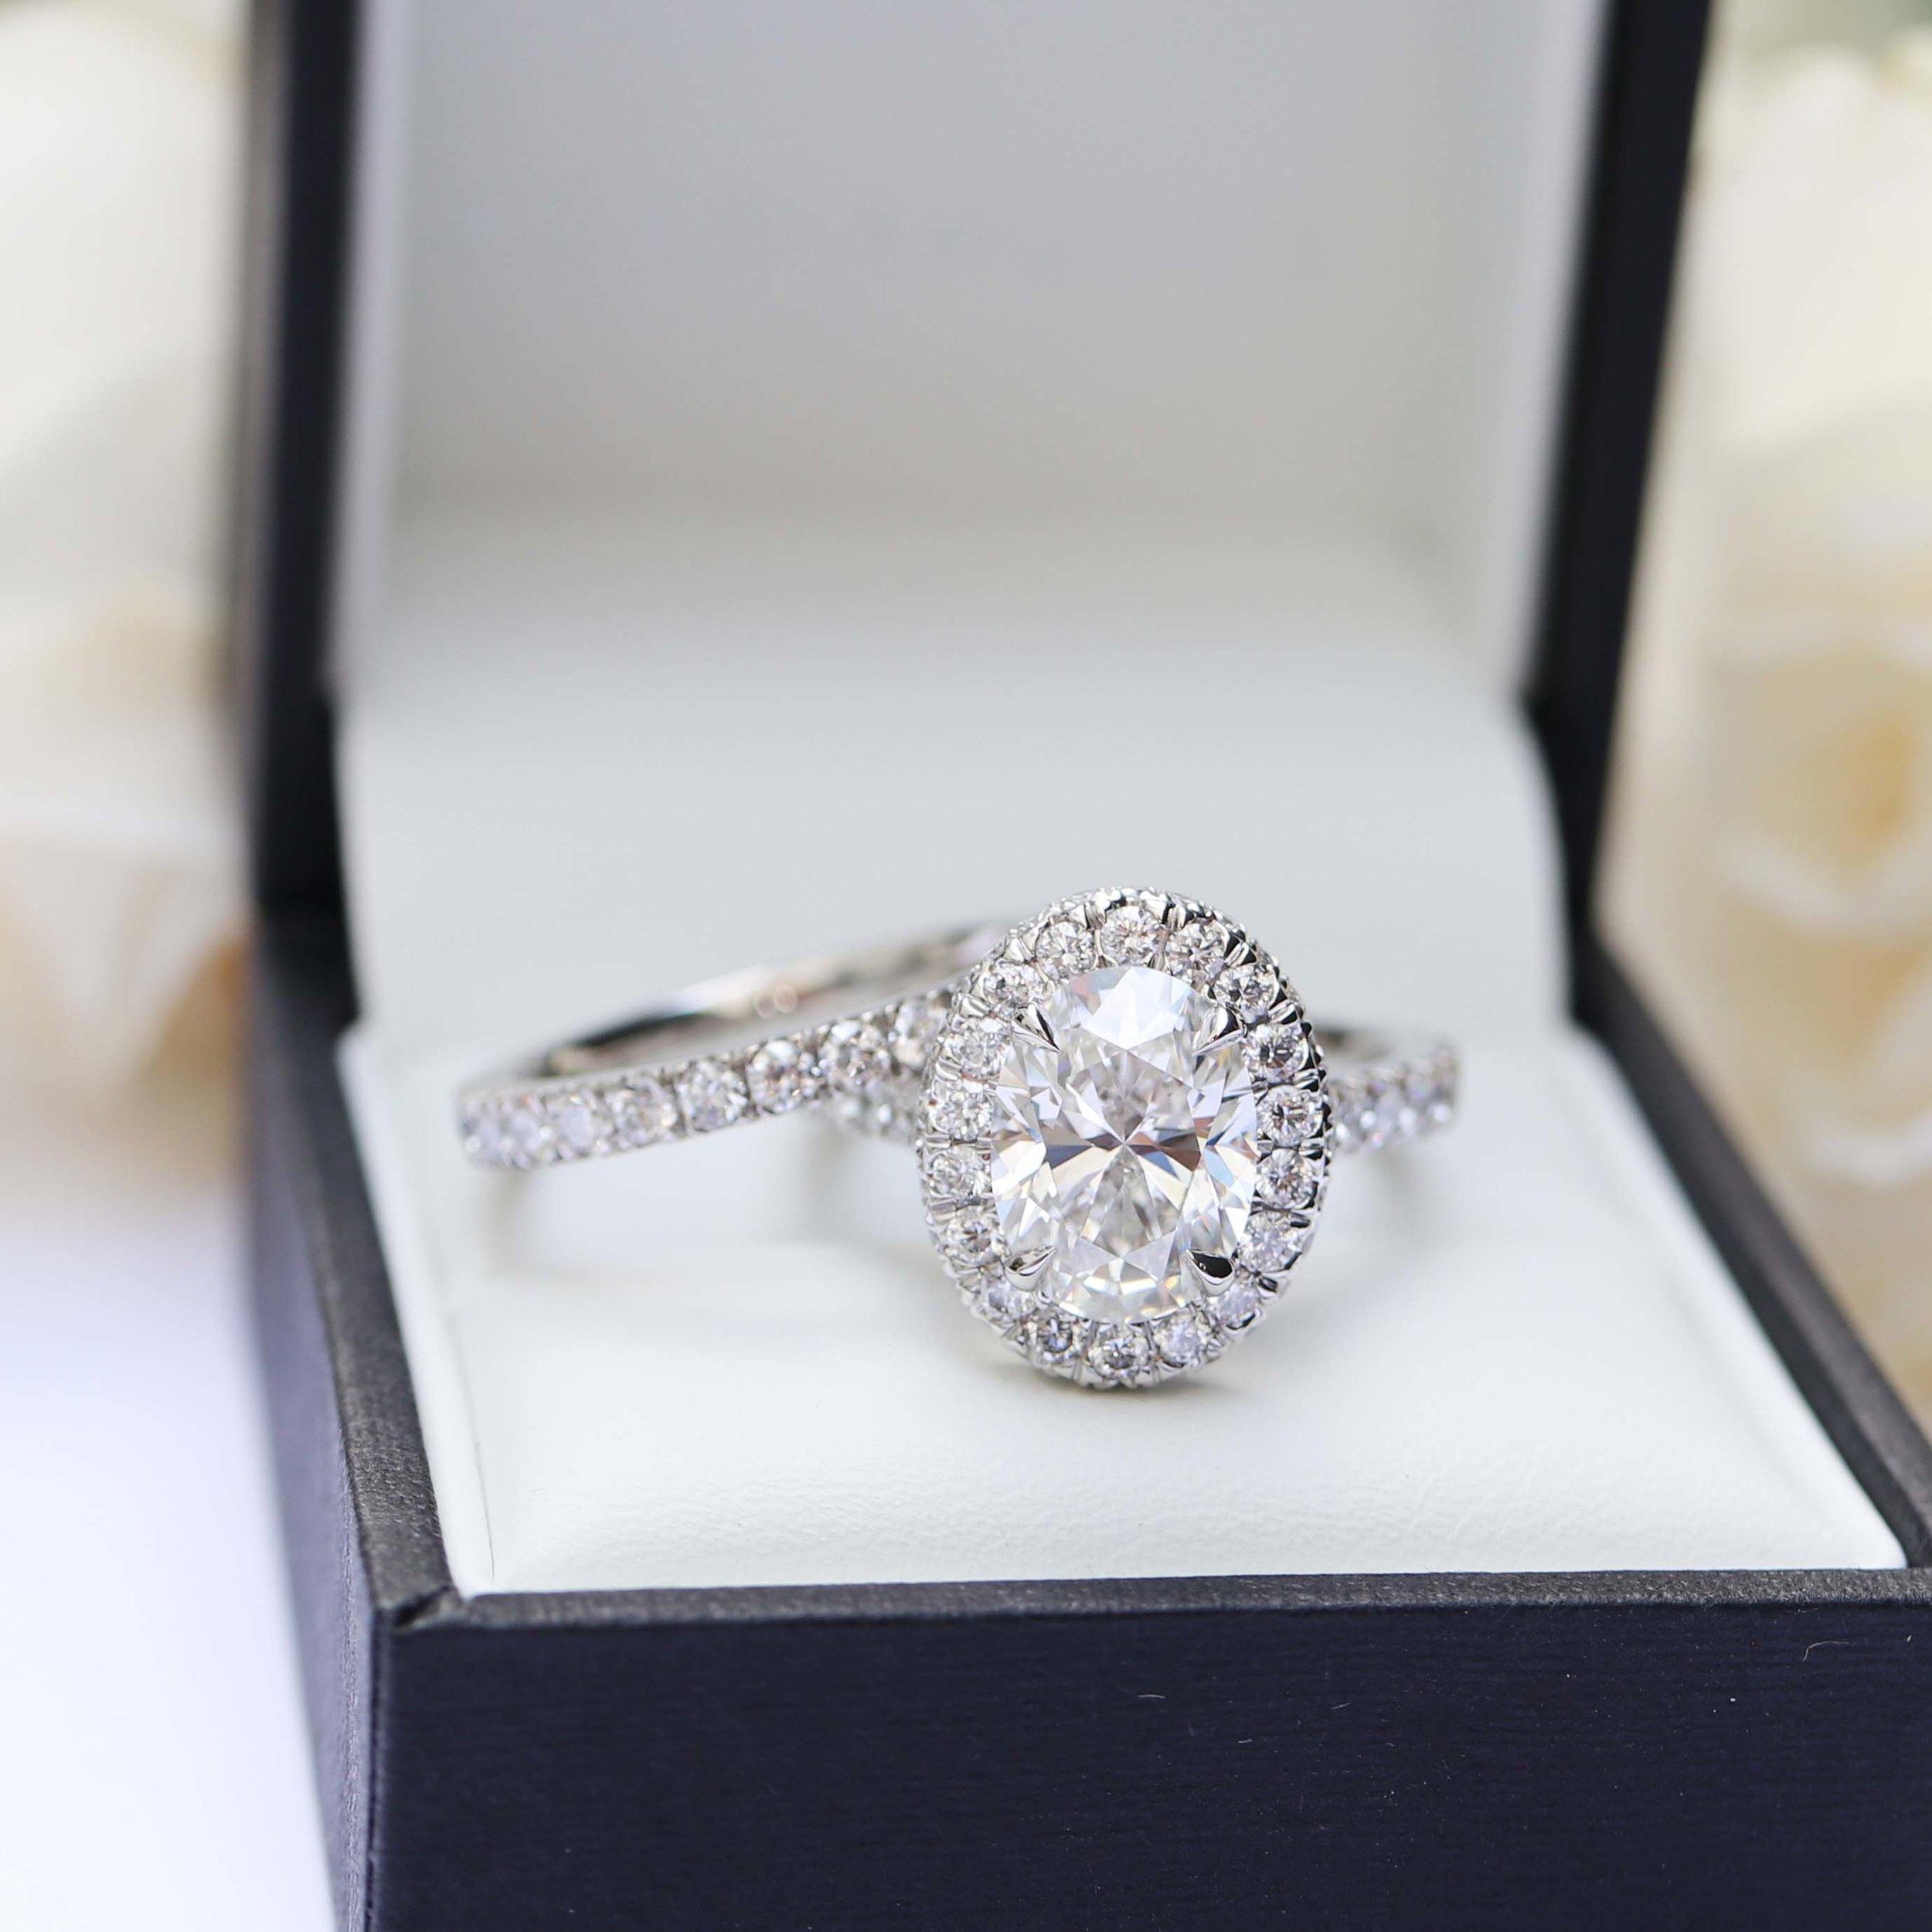 Double Sided Halo Setting Custom Lab Diamond Engagement Ring